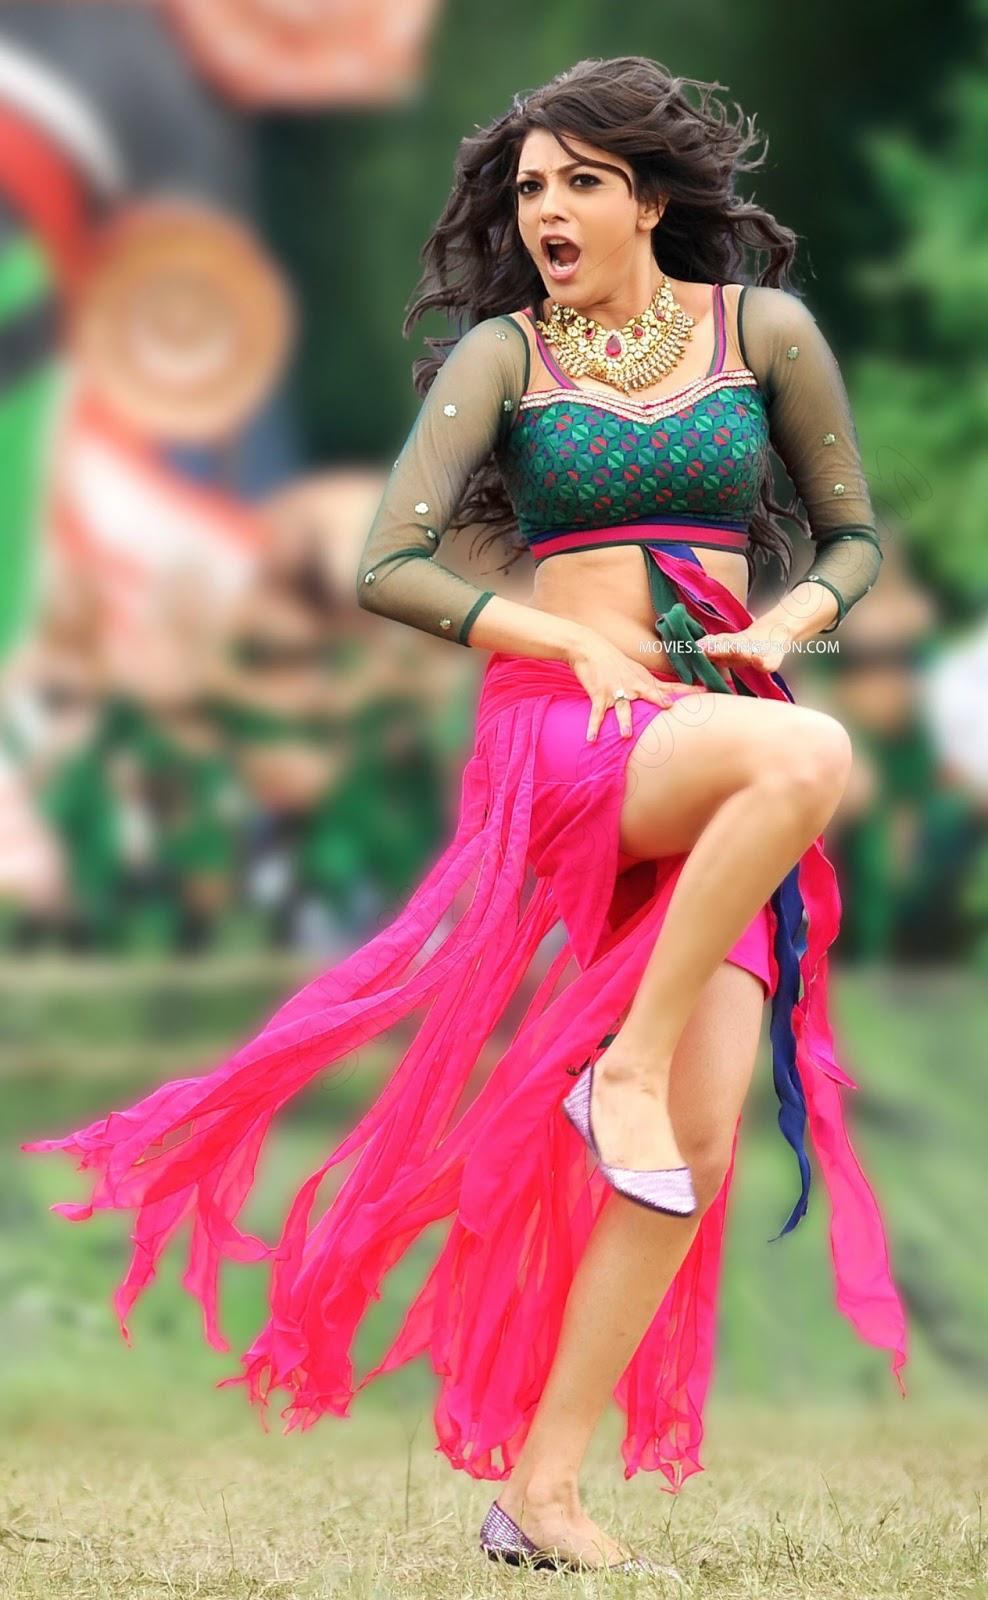 Kajal In Nayak Movie Hot Hd Images - Atozallmovie-2534